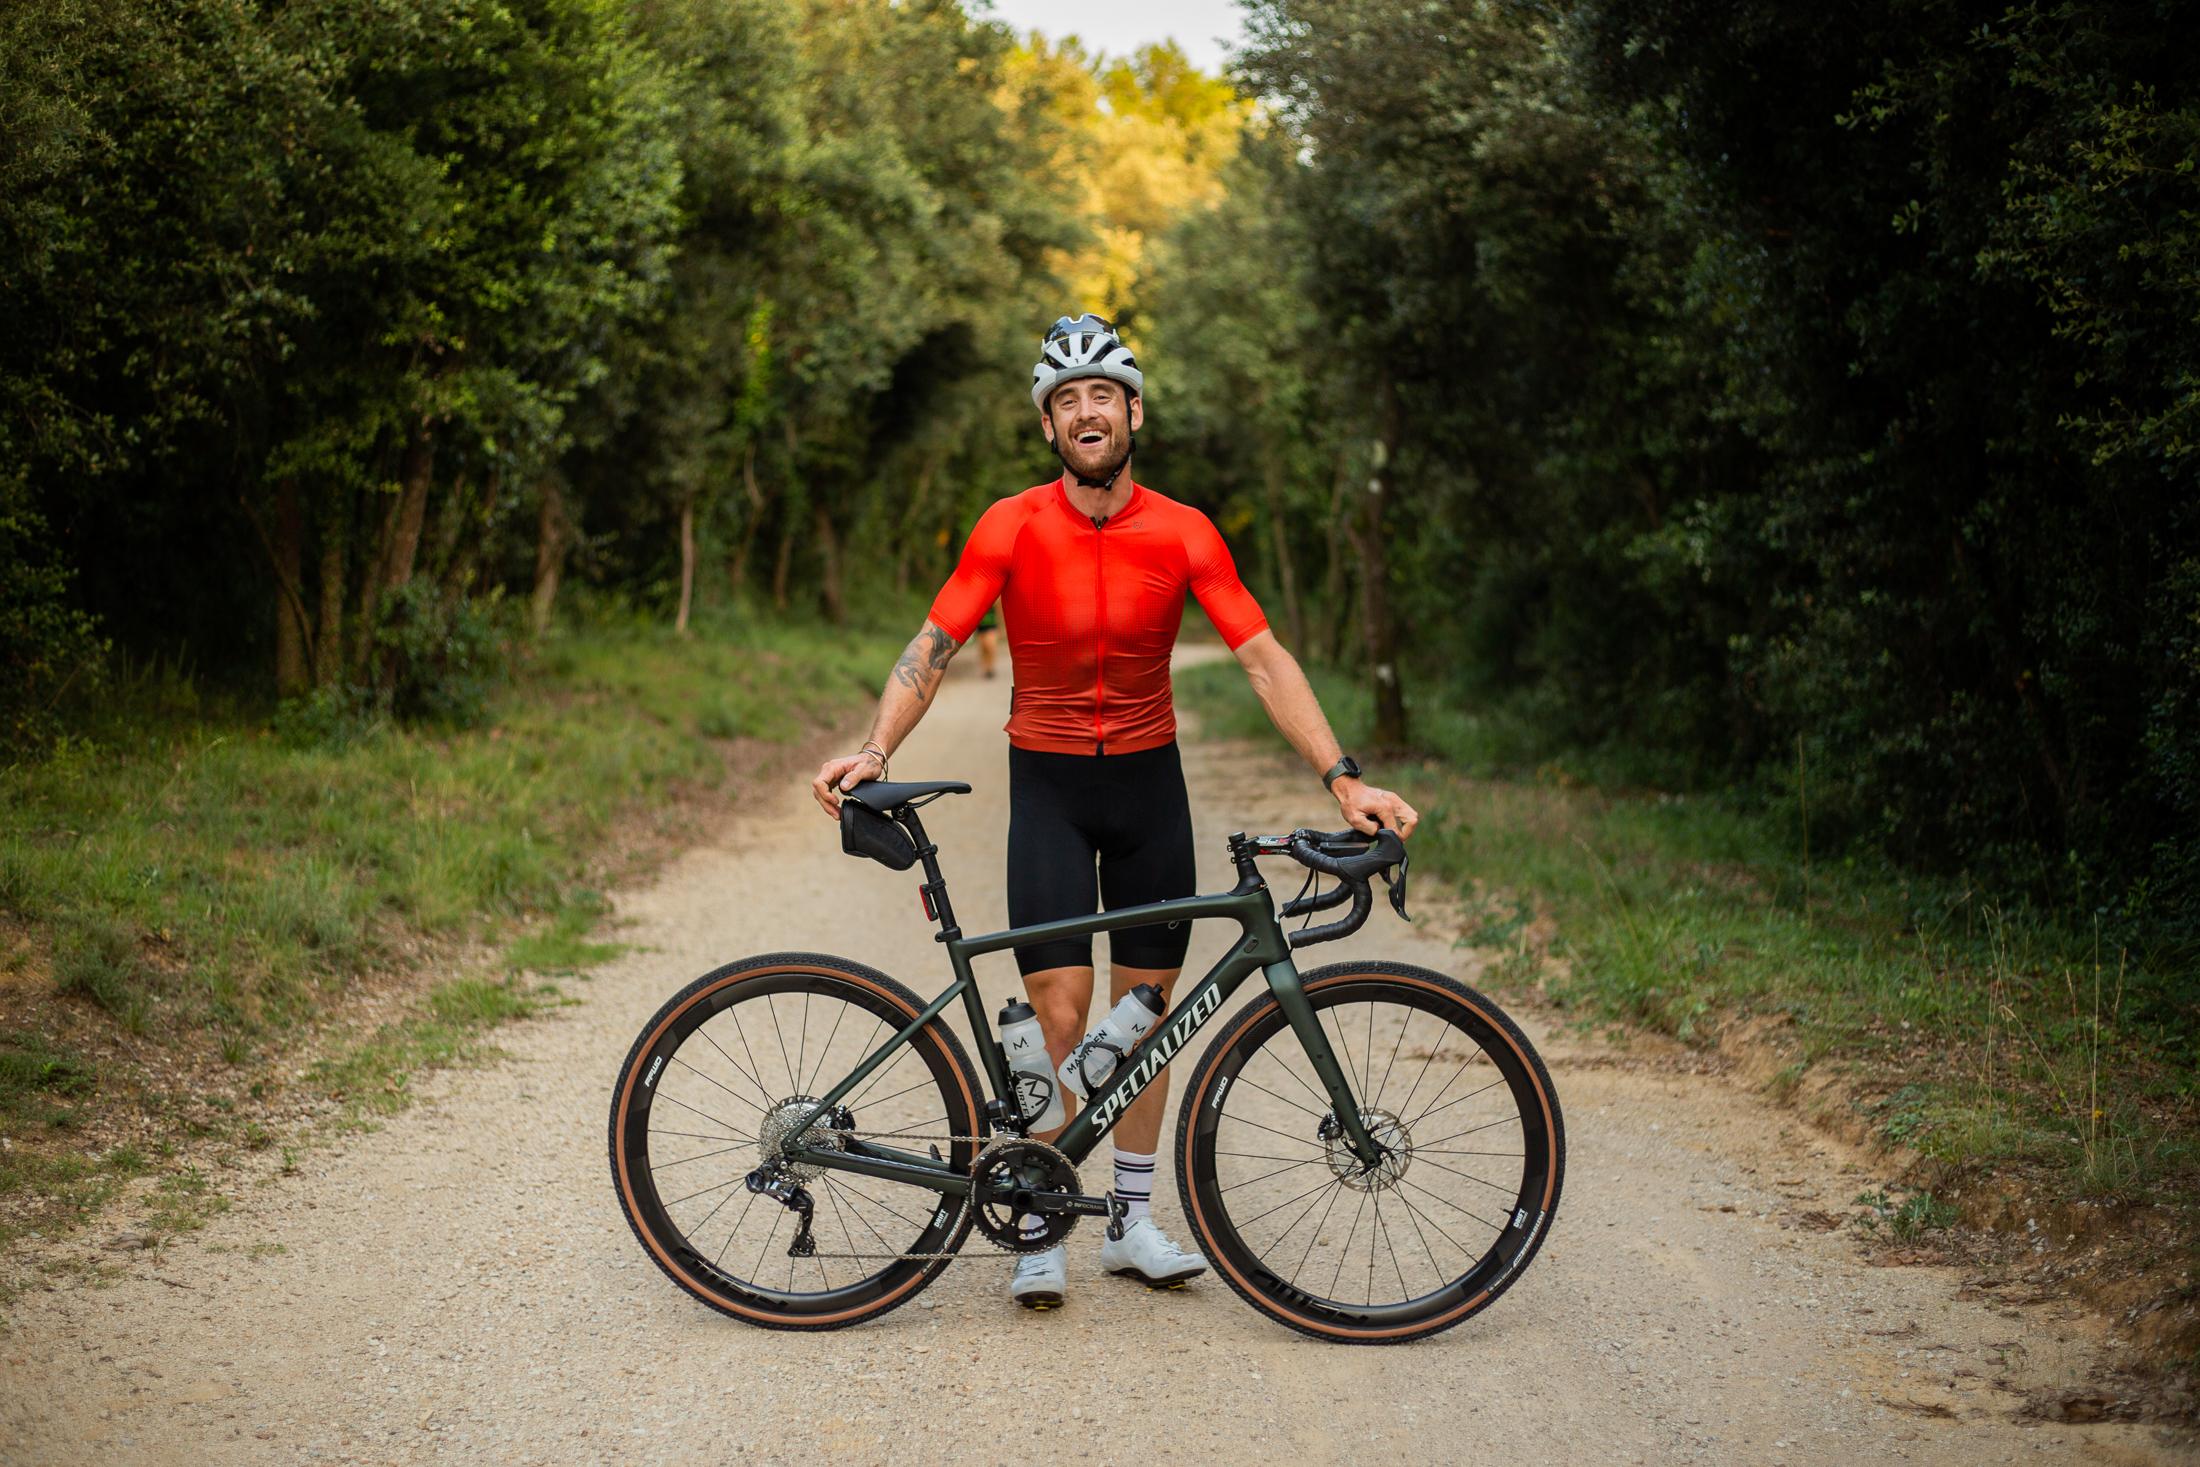 jack ultra cyclist